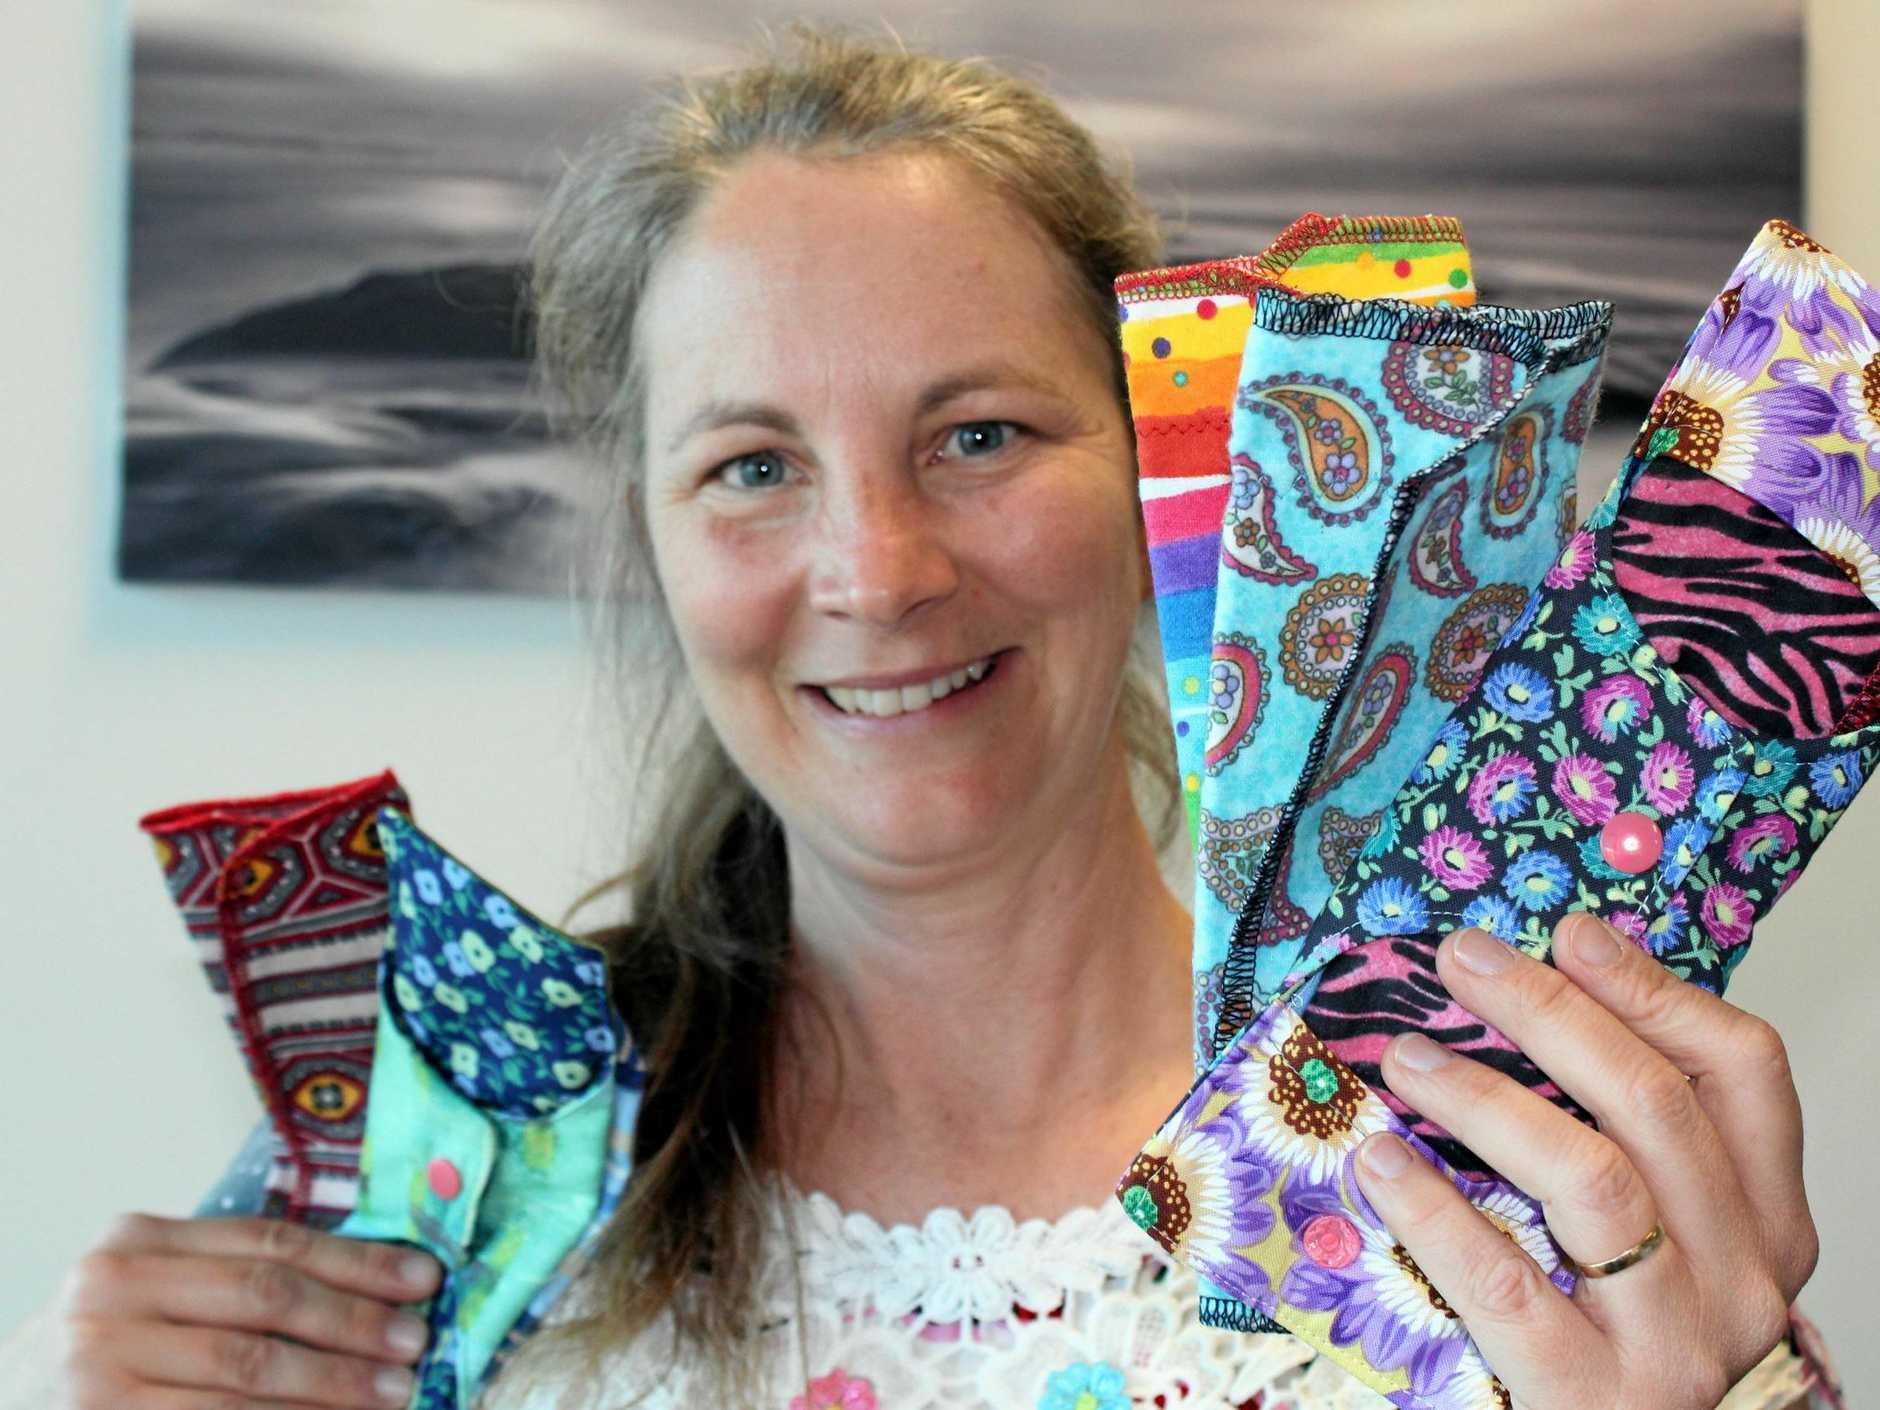 Leanne Purvis hopes take 200 feminine hygiene packs to women and girls in Cambodia in November.